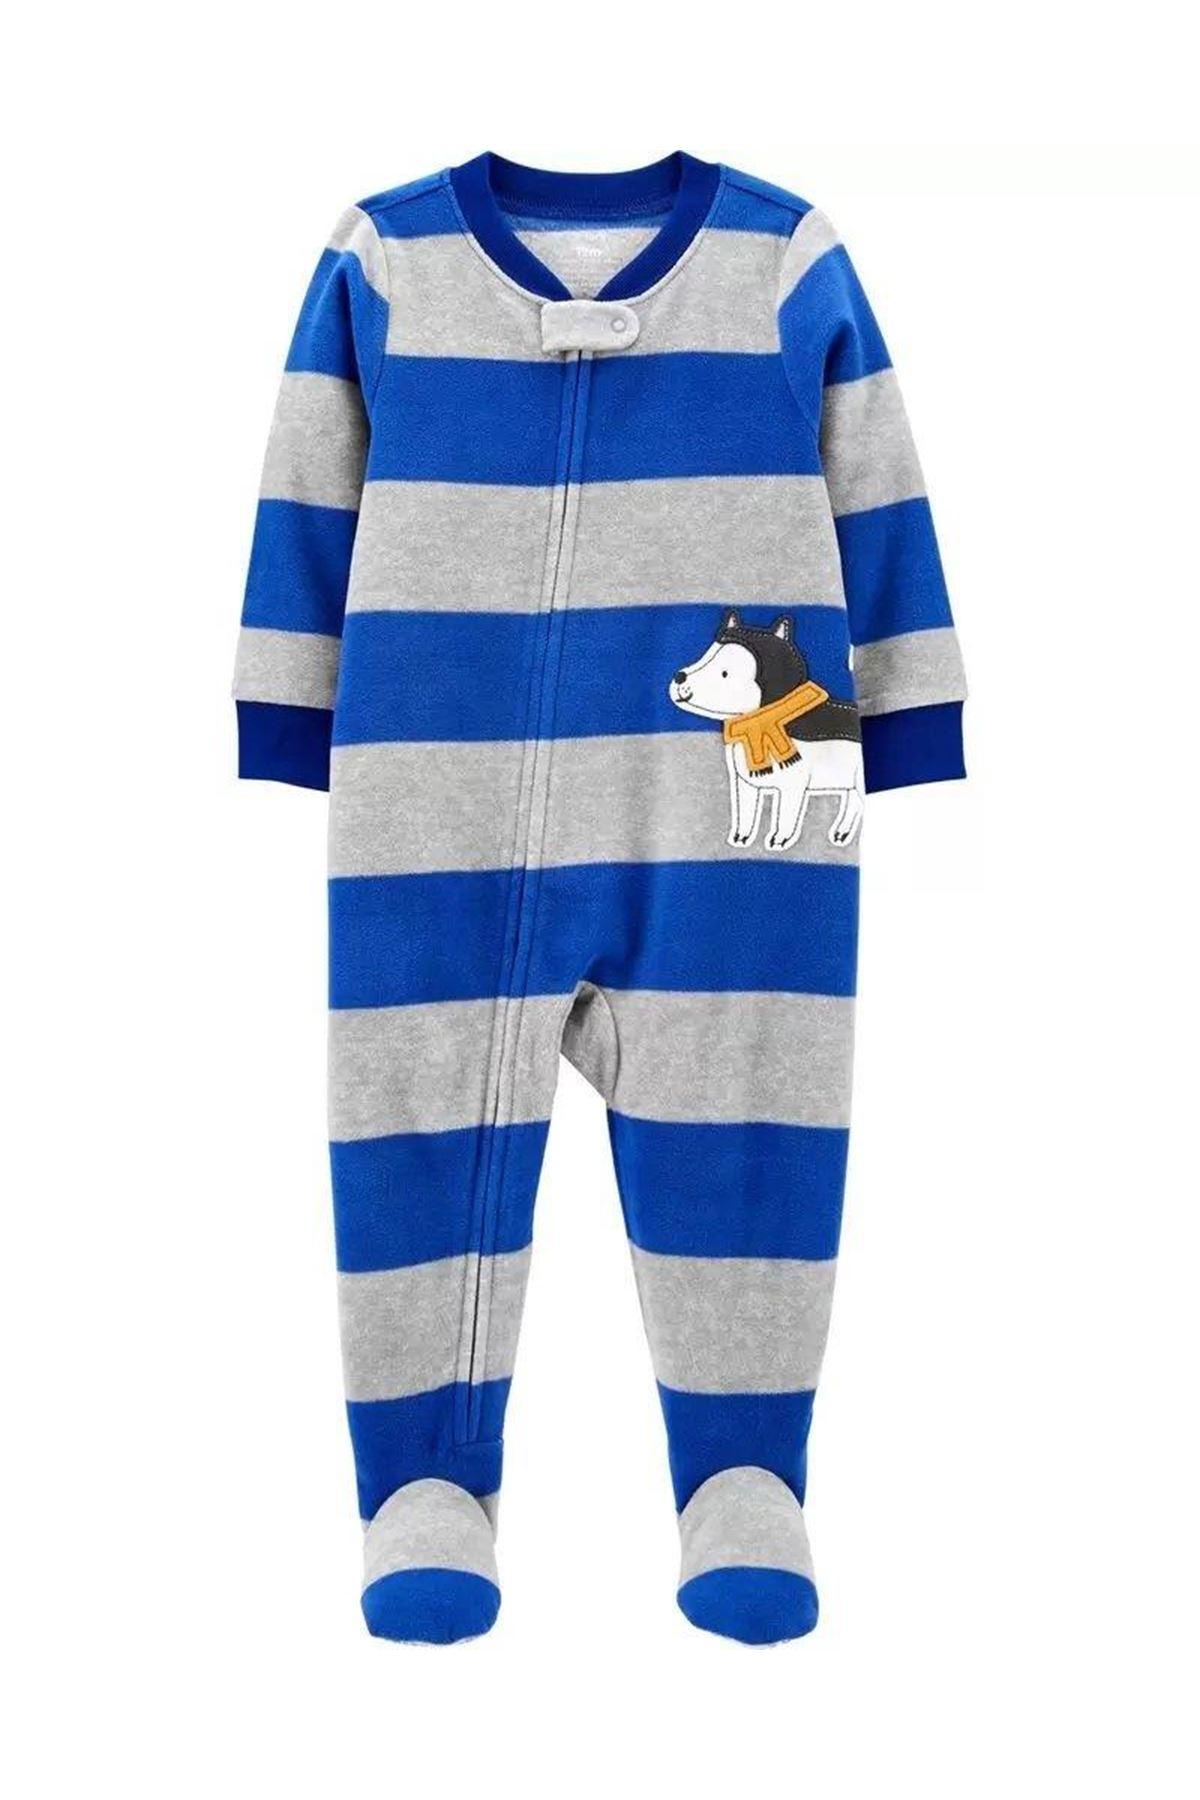 Carter's Erkek Bebek Polar Pijama Tulum 1J228610 Print